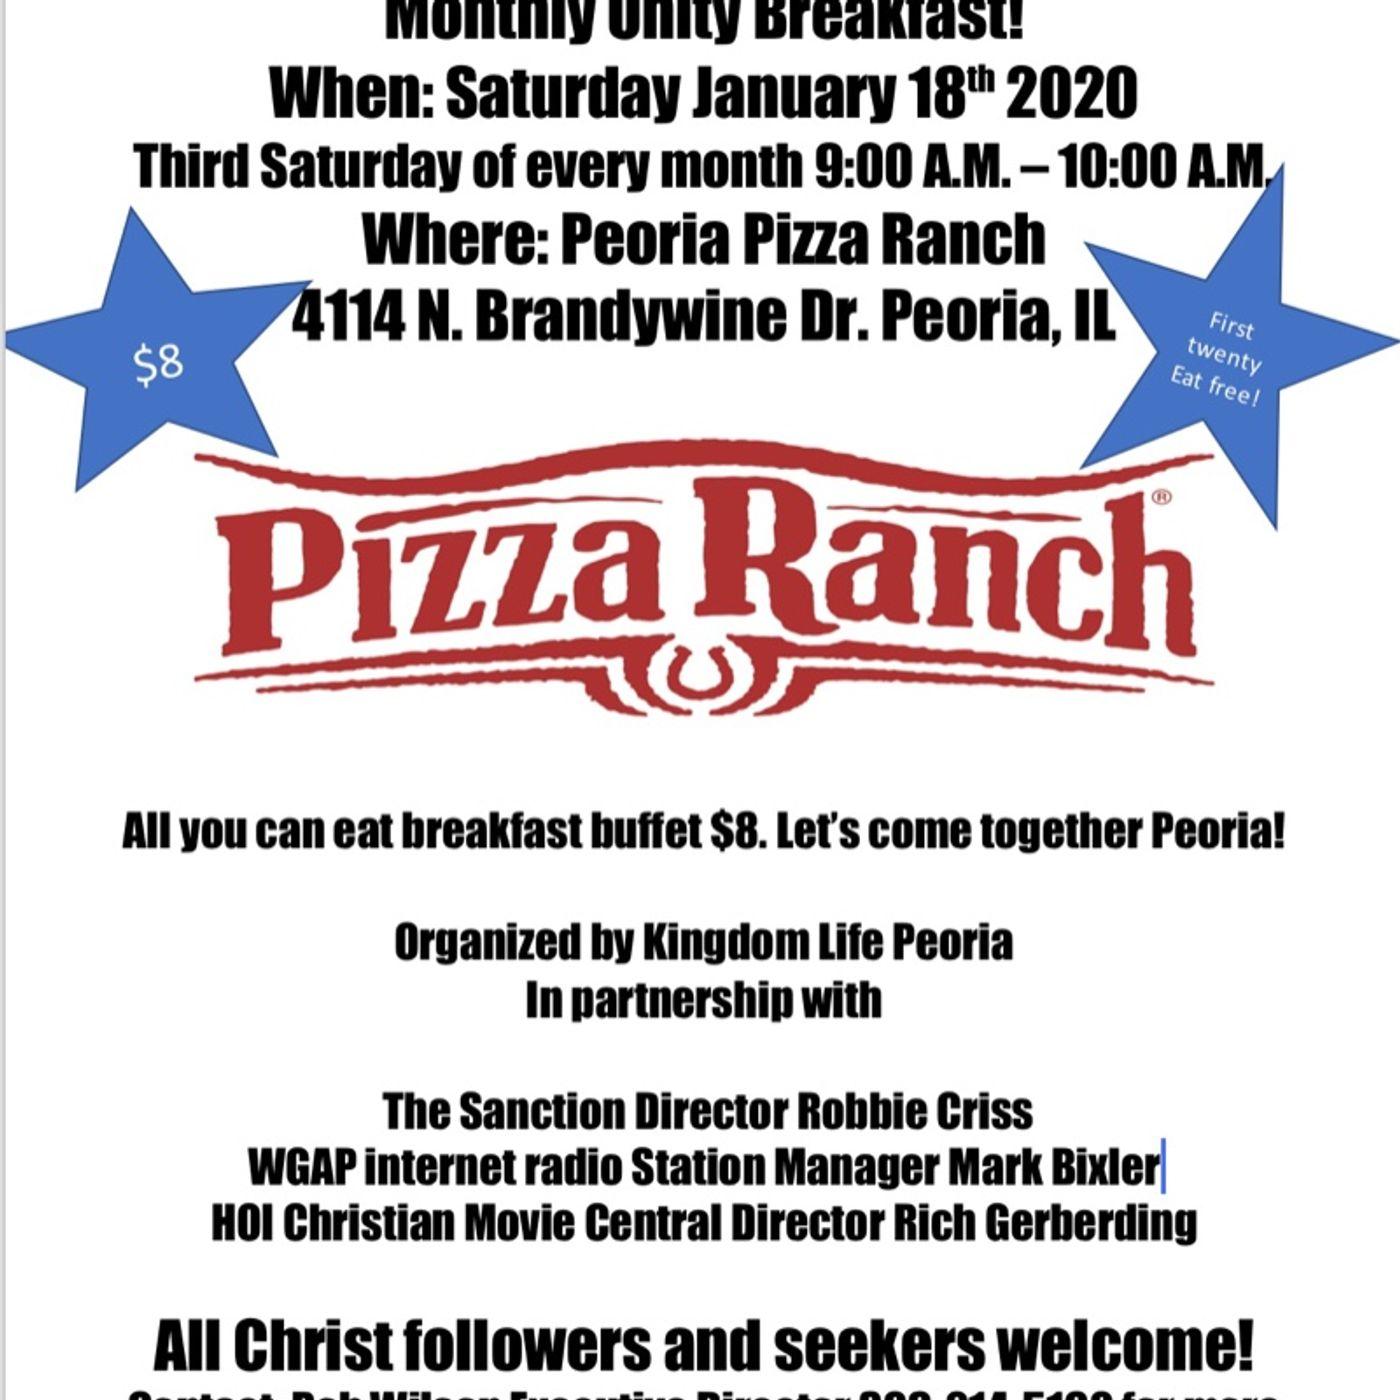 Episode - Kingdom Unity Breakfast! Let' come together Peoria!